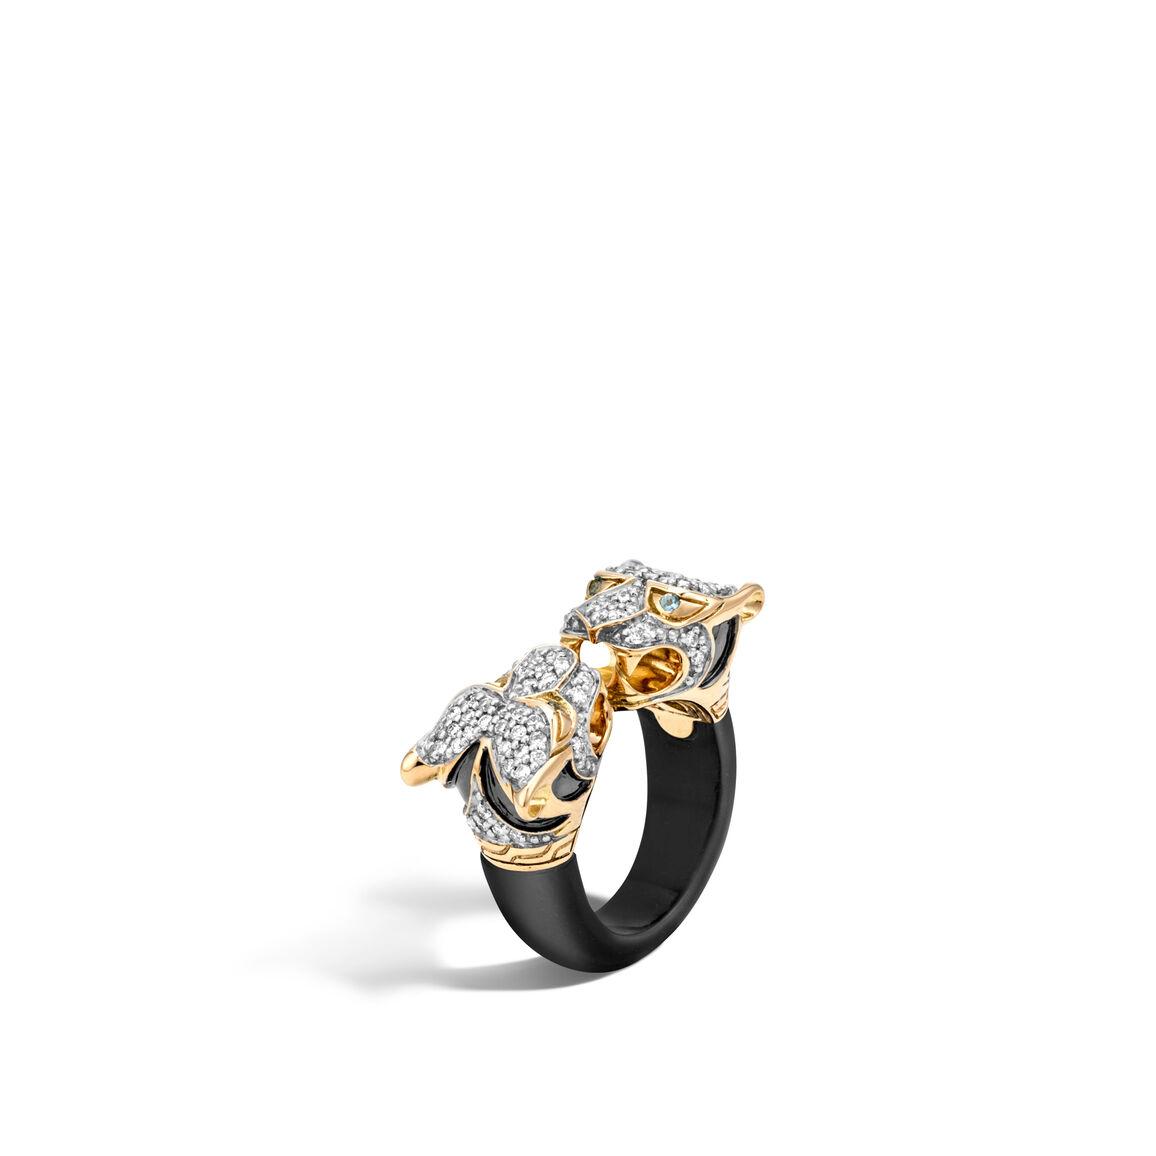 Legends Macan Double Head Ring,18K Gold, Gemstone, Diamonds